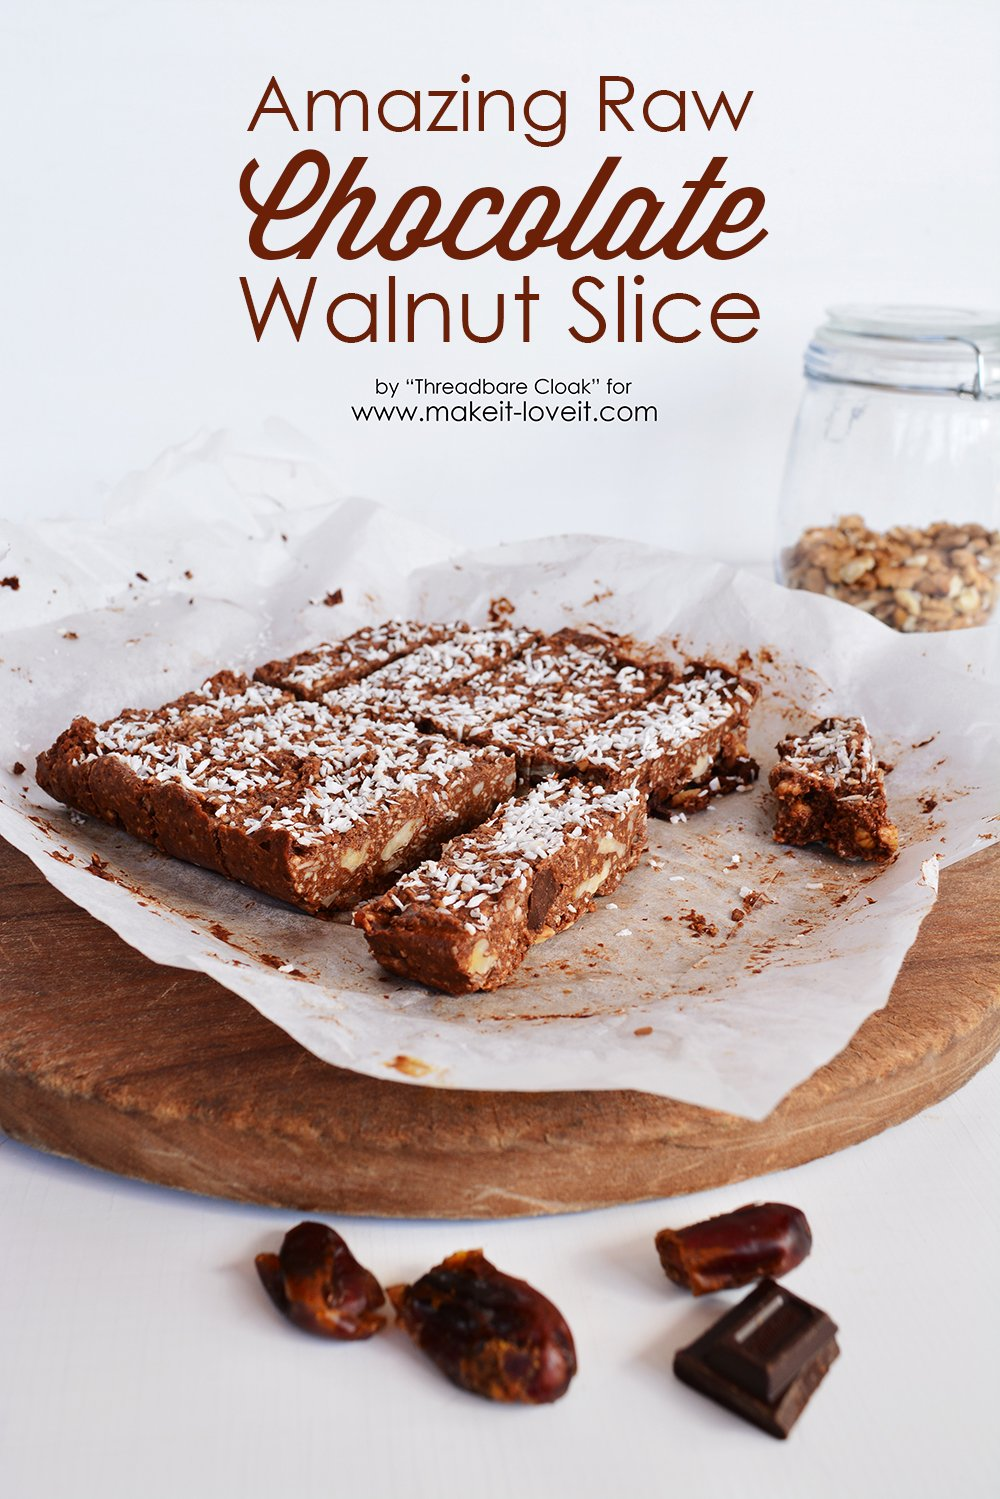 Raw Chocolate Walnut Slice recipe   makeit-loveit.com